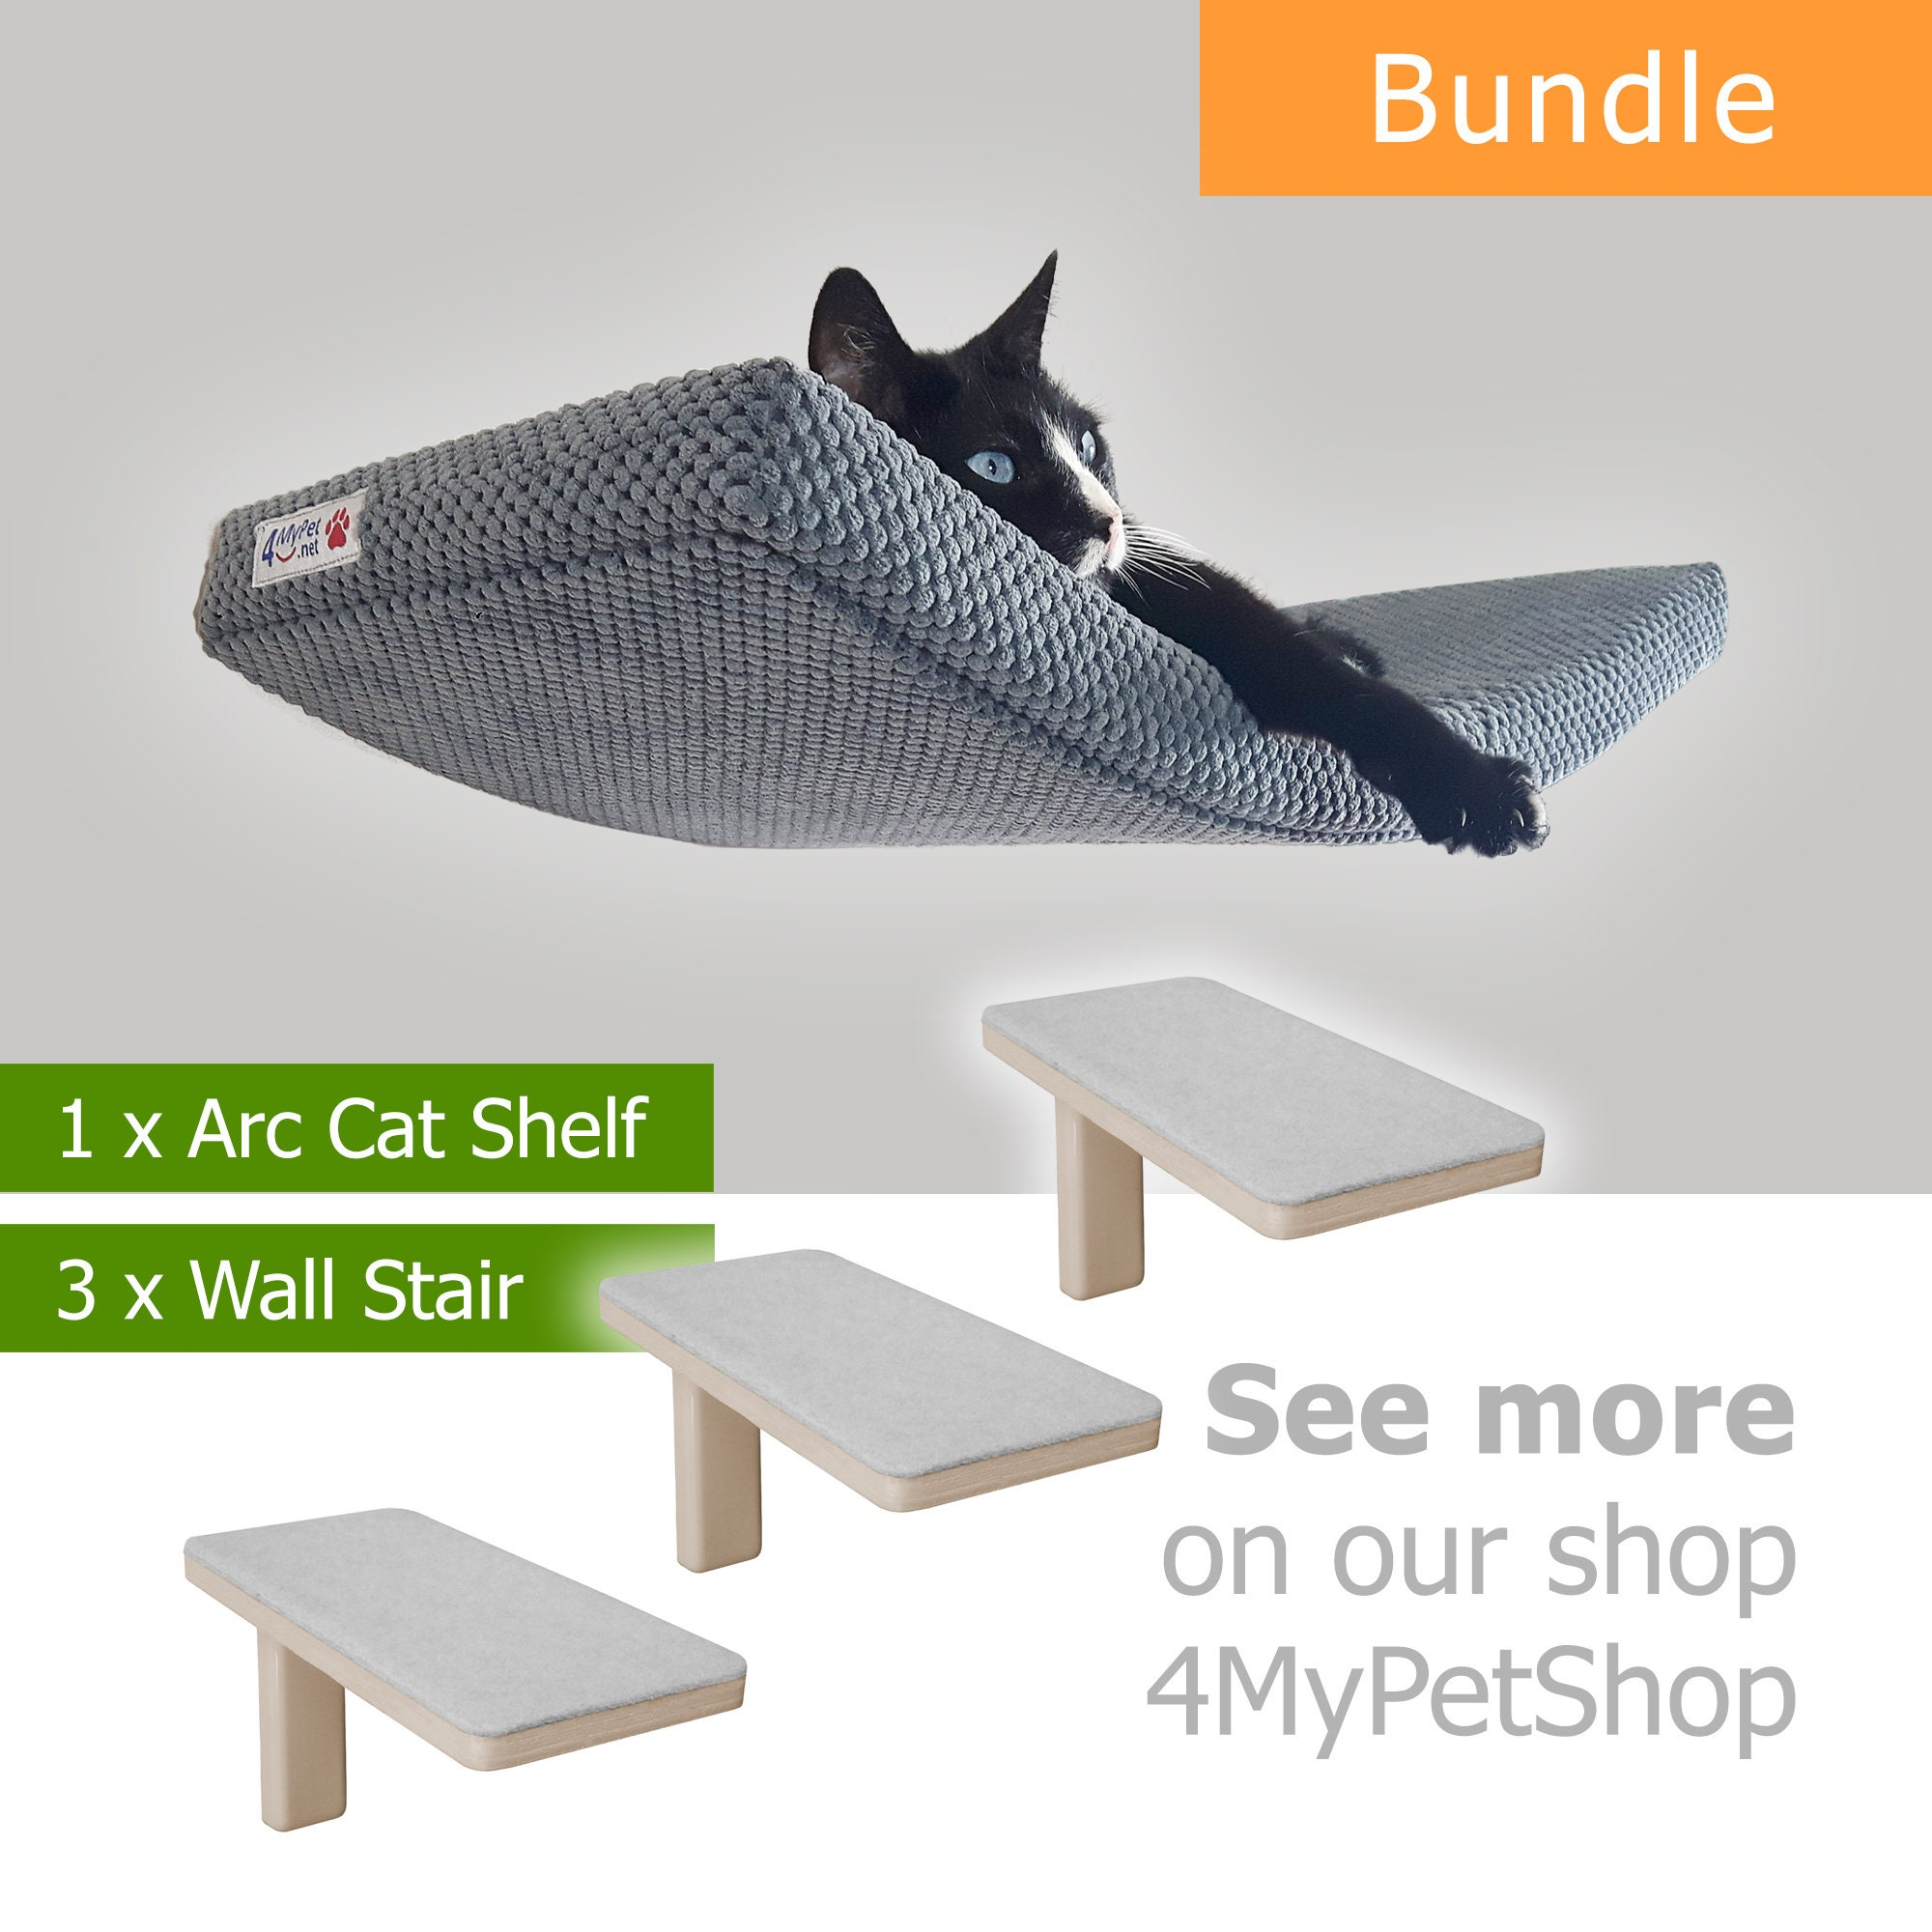 ARC 60 bundle 1+3 cat shelf cat shelves cat furniture cat bed cat wall shelves cat perch catze cat gift kitten stair step cat climbing